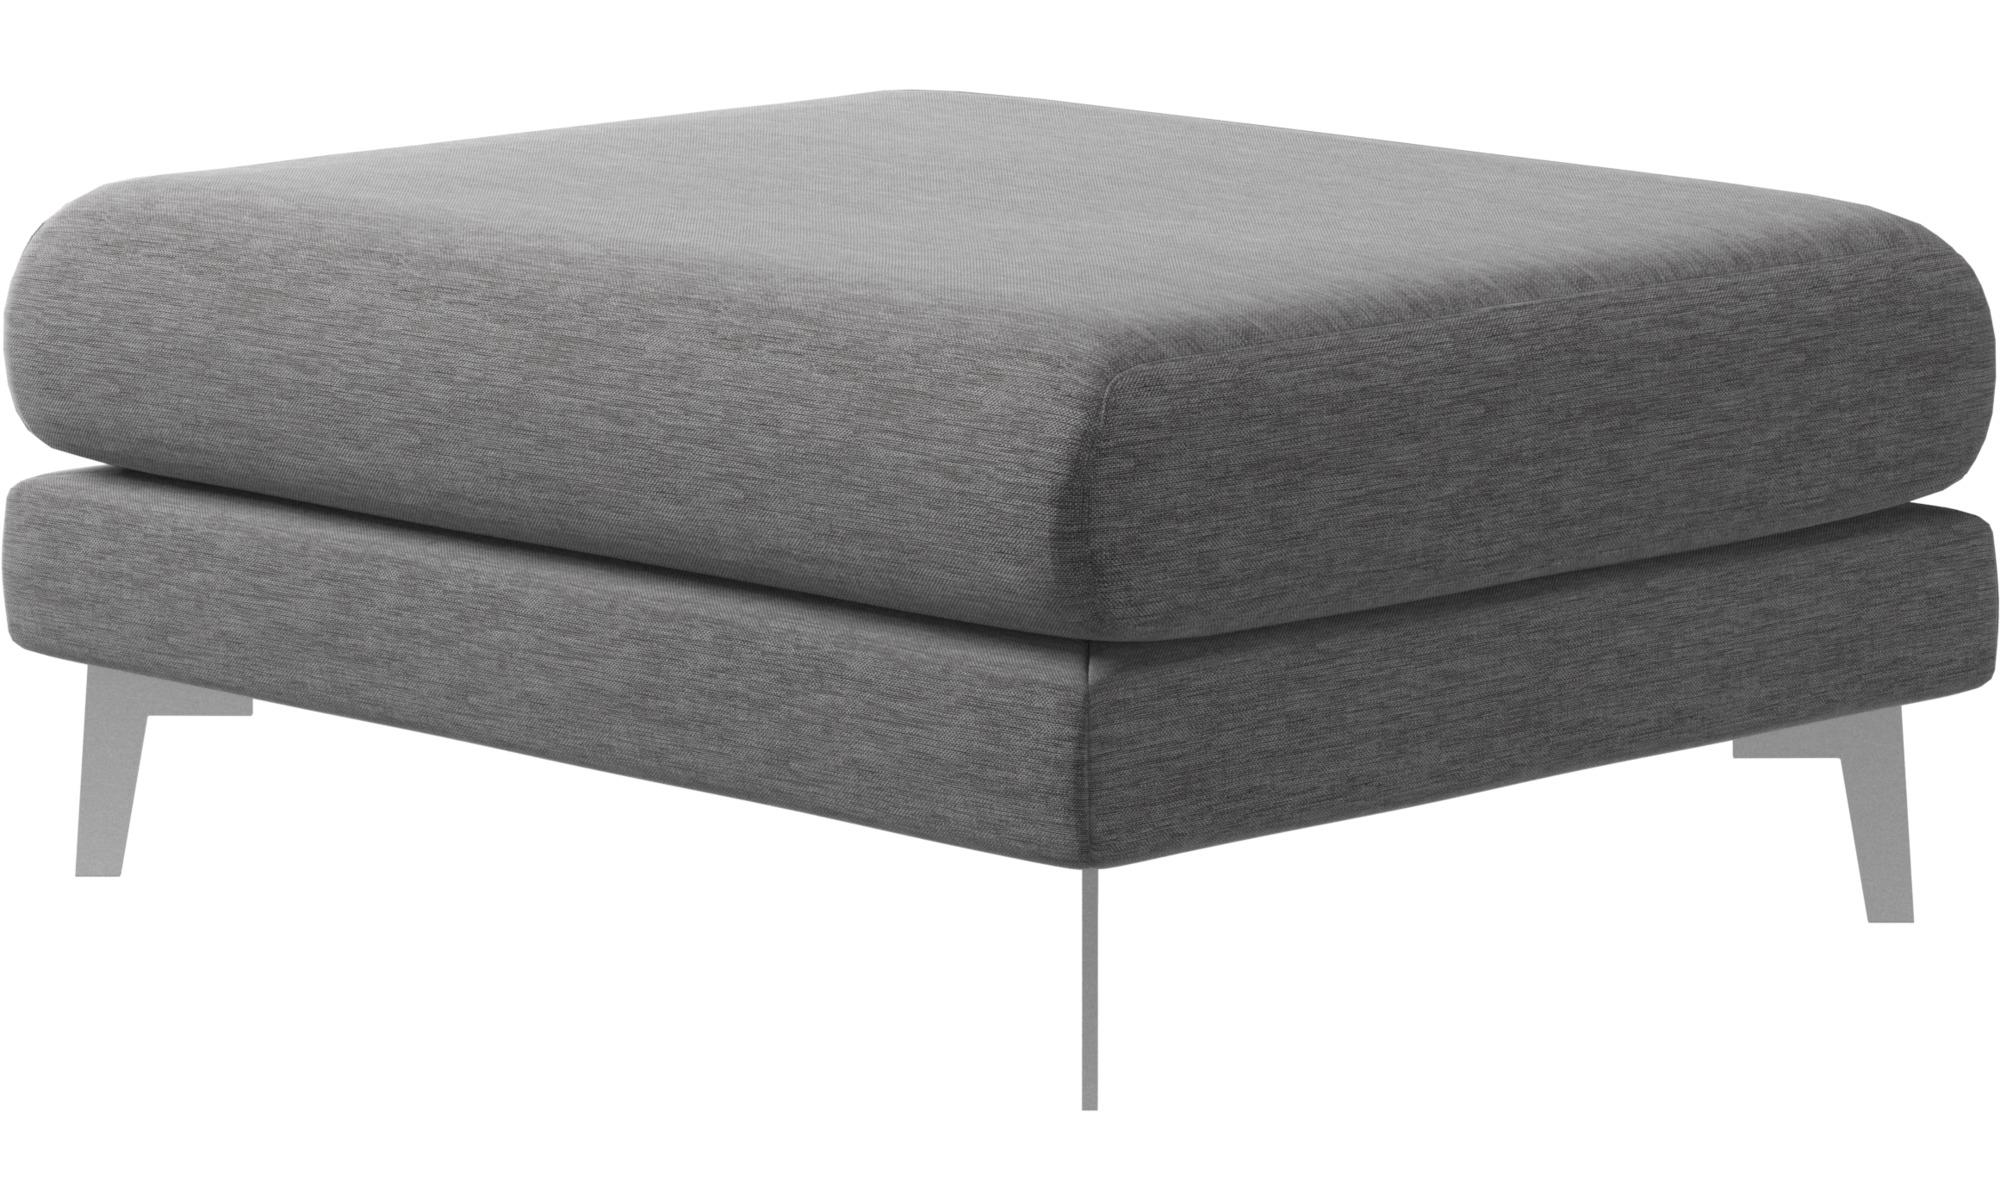 footstools fargo ottoman boconcept. Black Bedroom Furniture Sets. Home Design Ideas